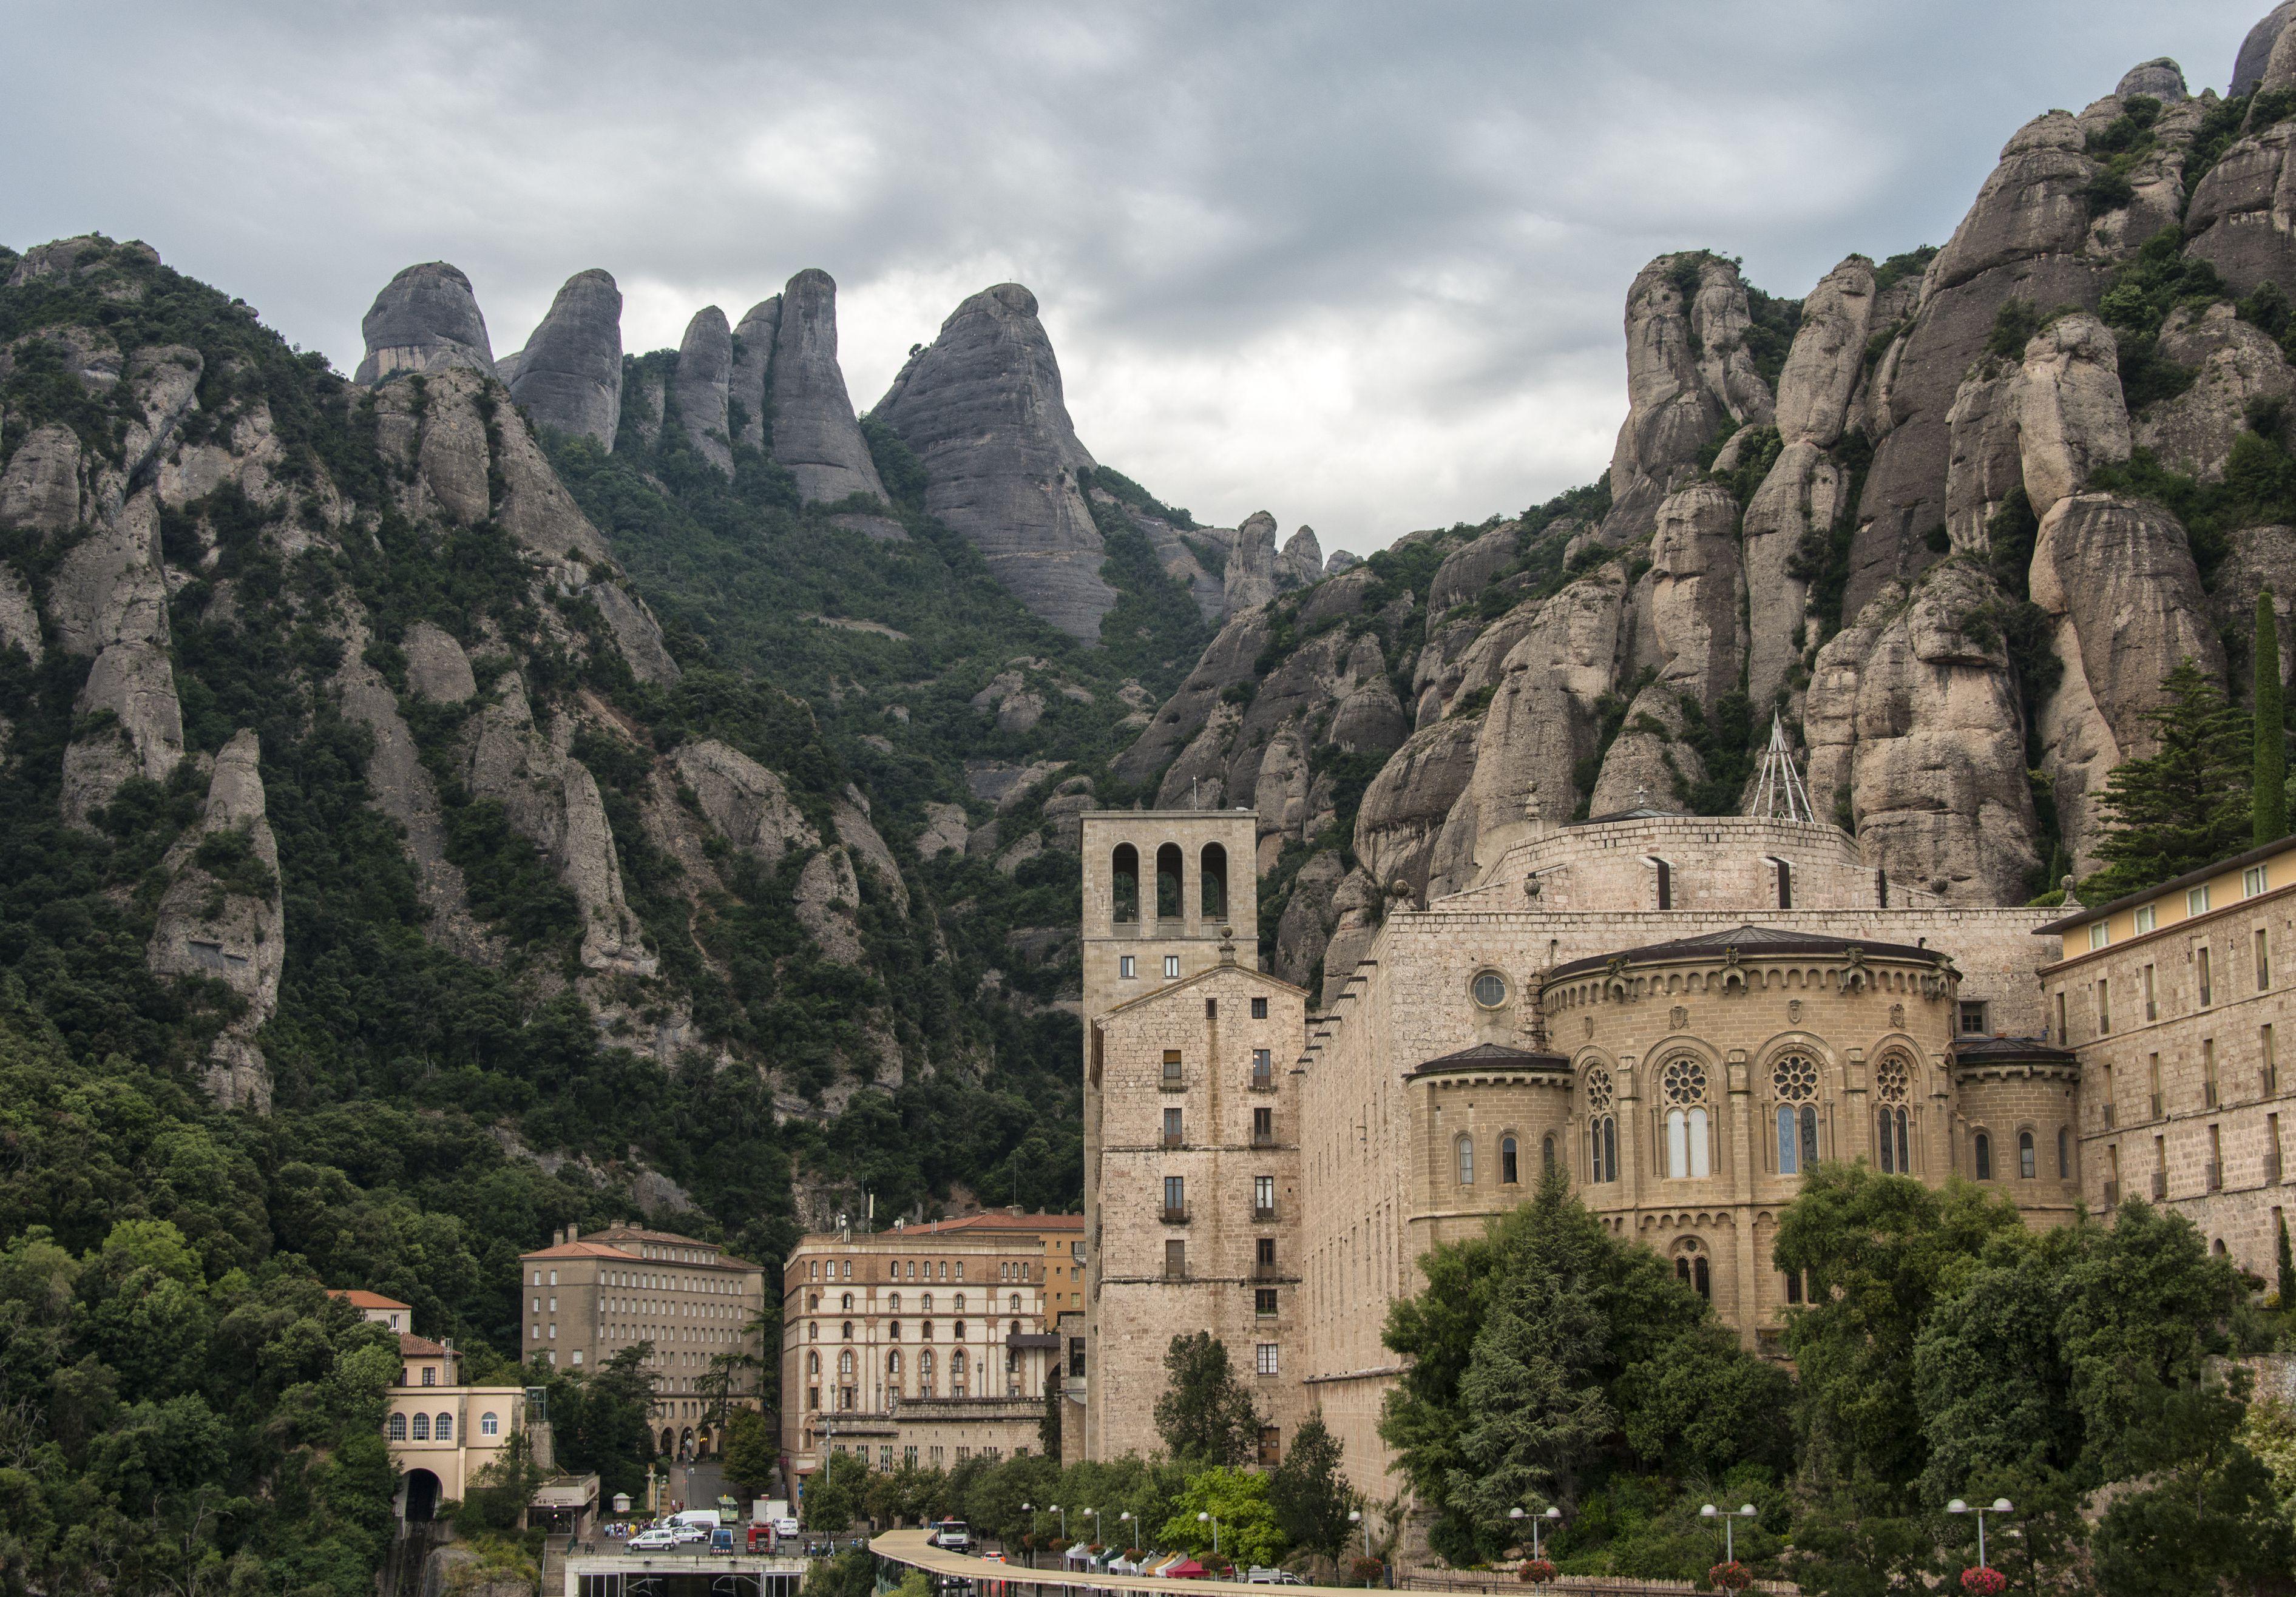 Santa Maria de Montserrat Abbey, Barcelona, Spain was built from conglomerate rock.